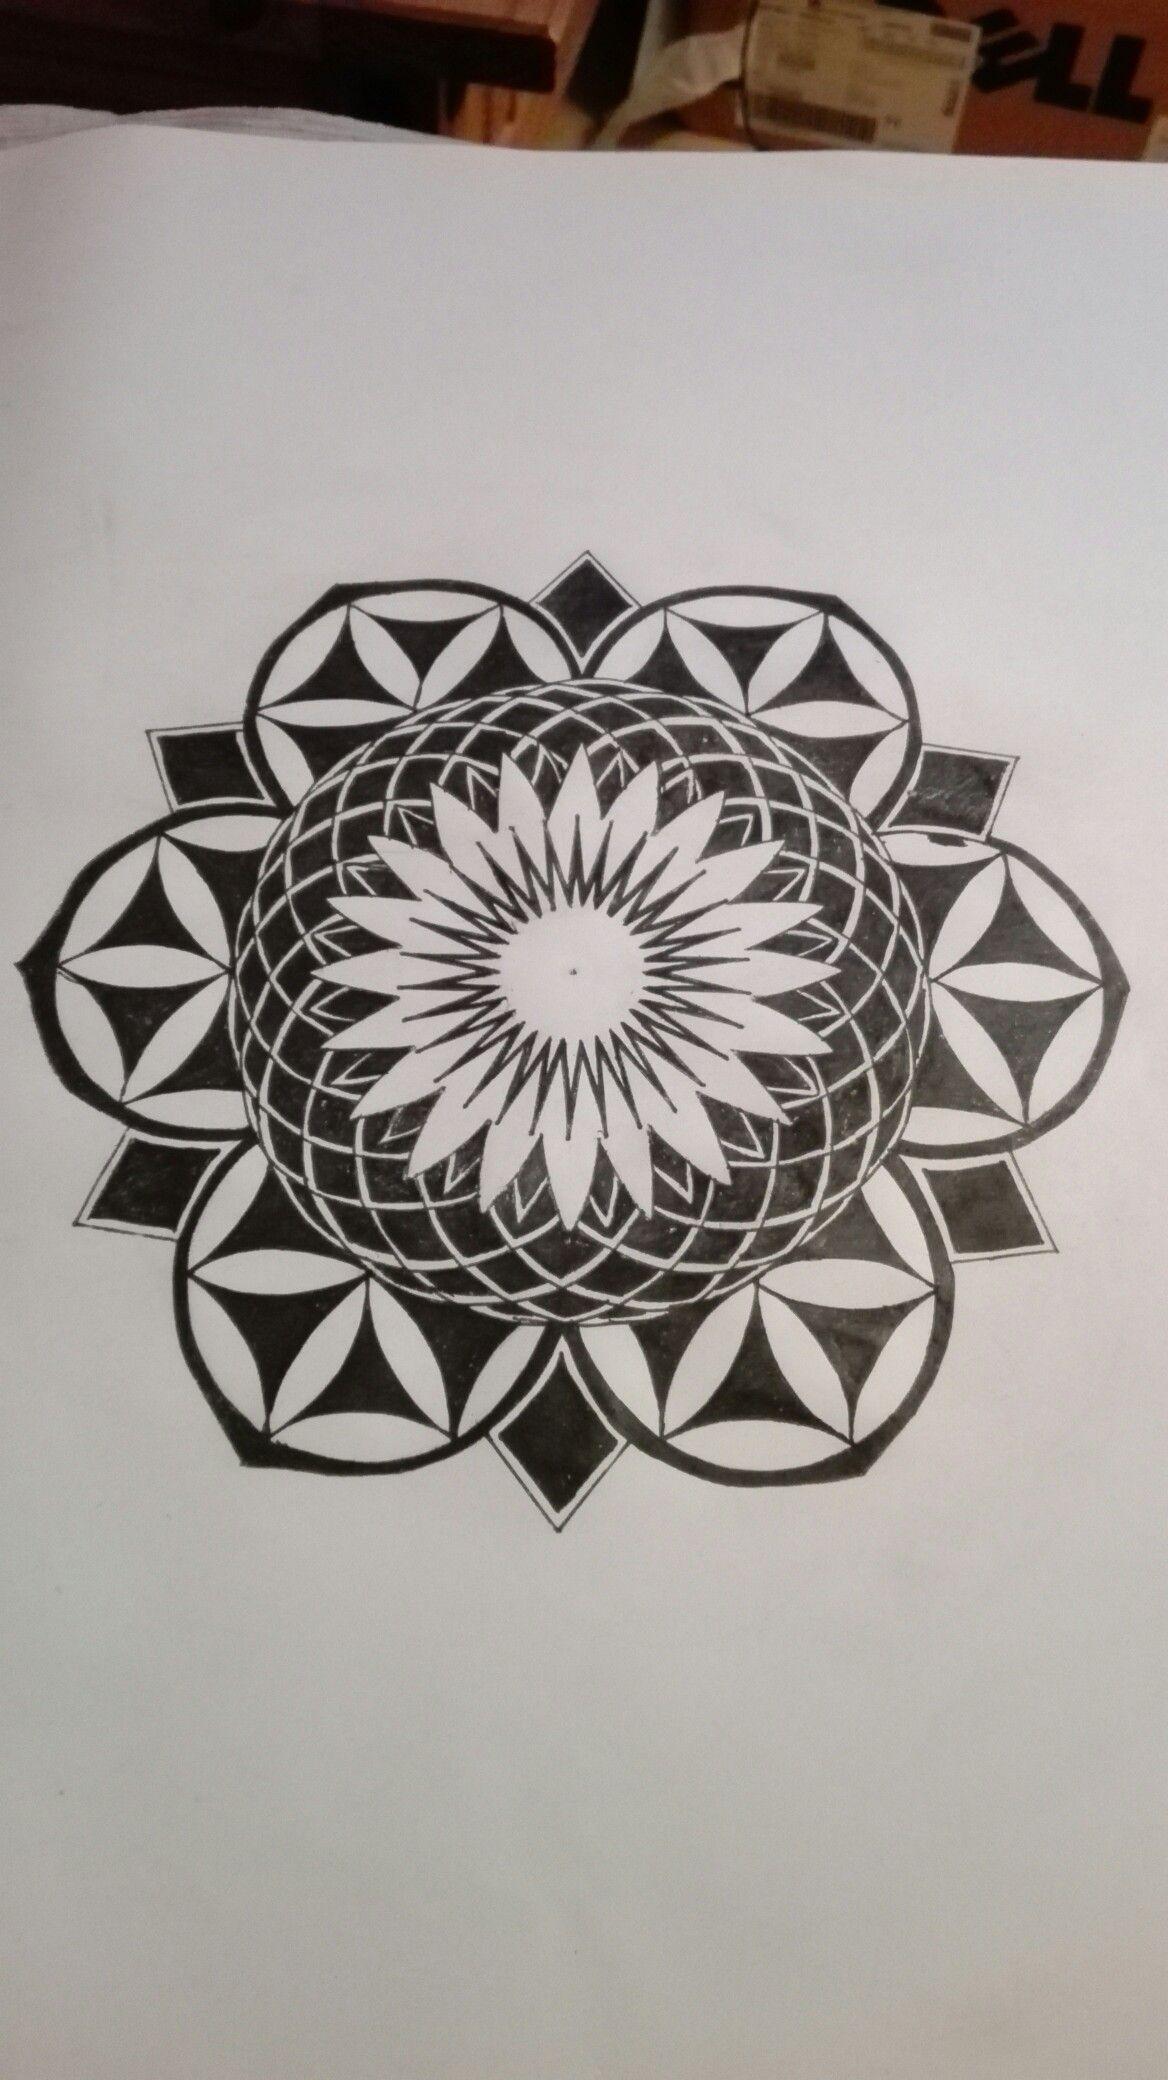 Mandala Tattoo Design Ancient Geometry Spiritual Mandala Tattoo Design Mandala Tattoo Tattoo Designs